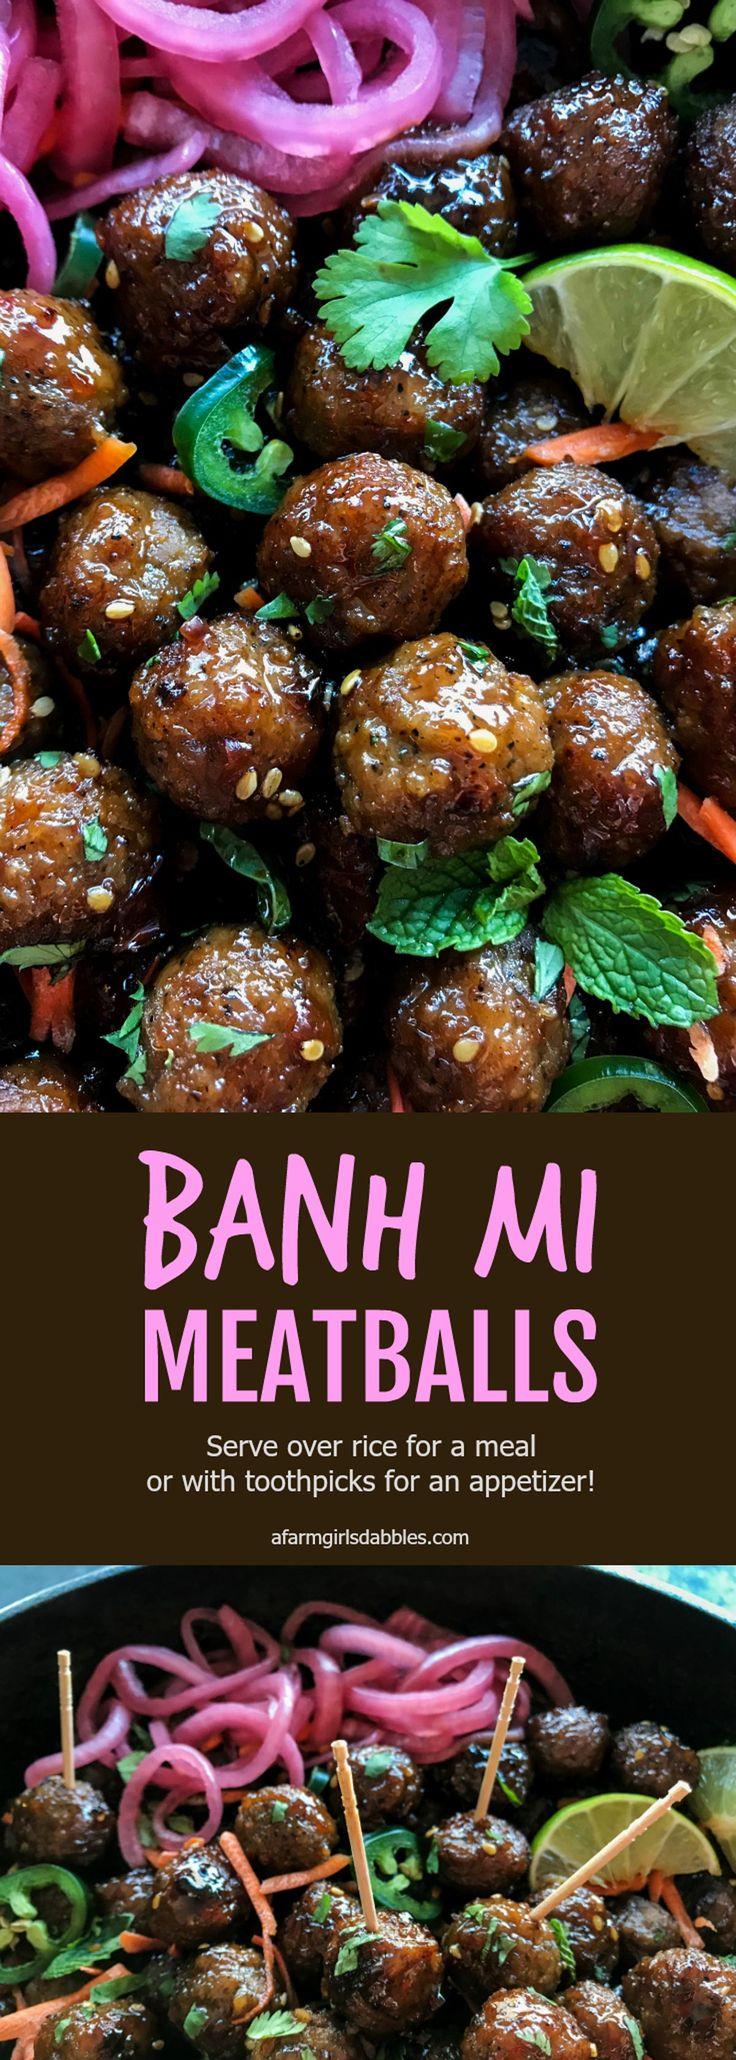 Banh Mi Meatballs from afarmgirlsdabbles.com #banhmi #meatballs